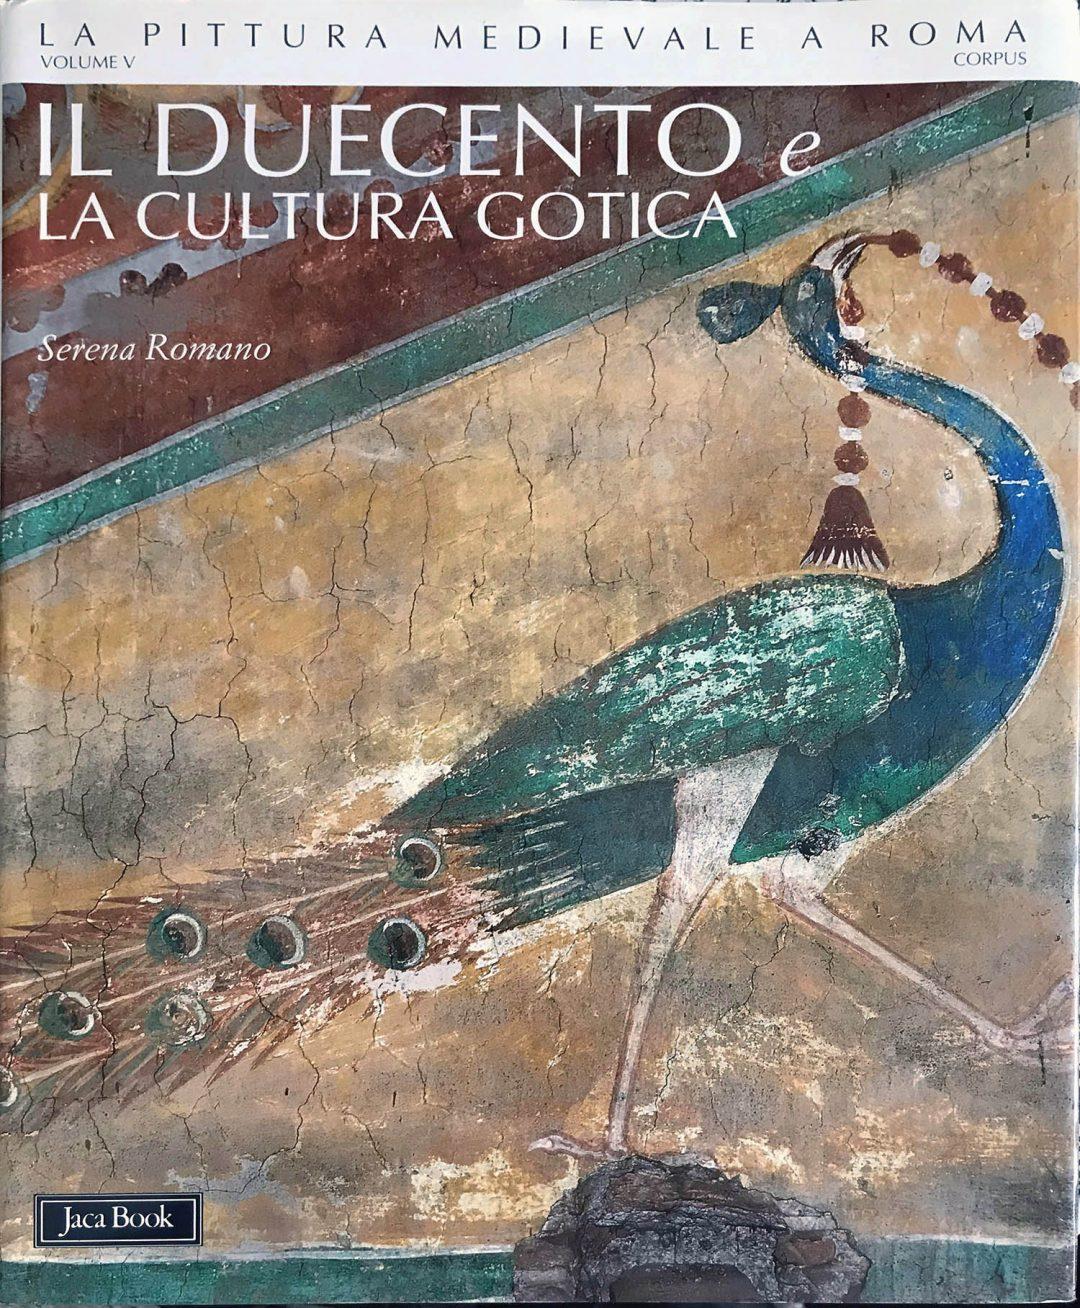 La Pittura Medievale a Roma. Corpus V.